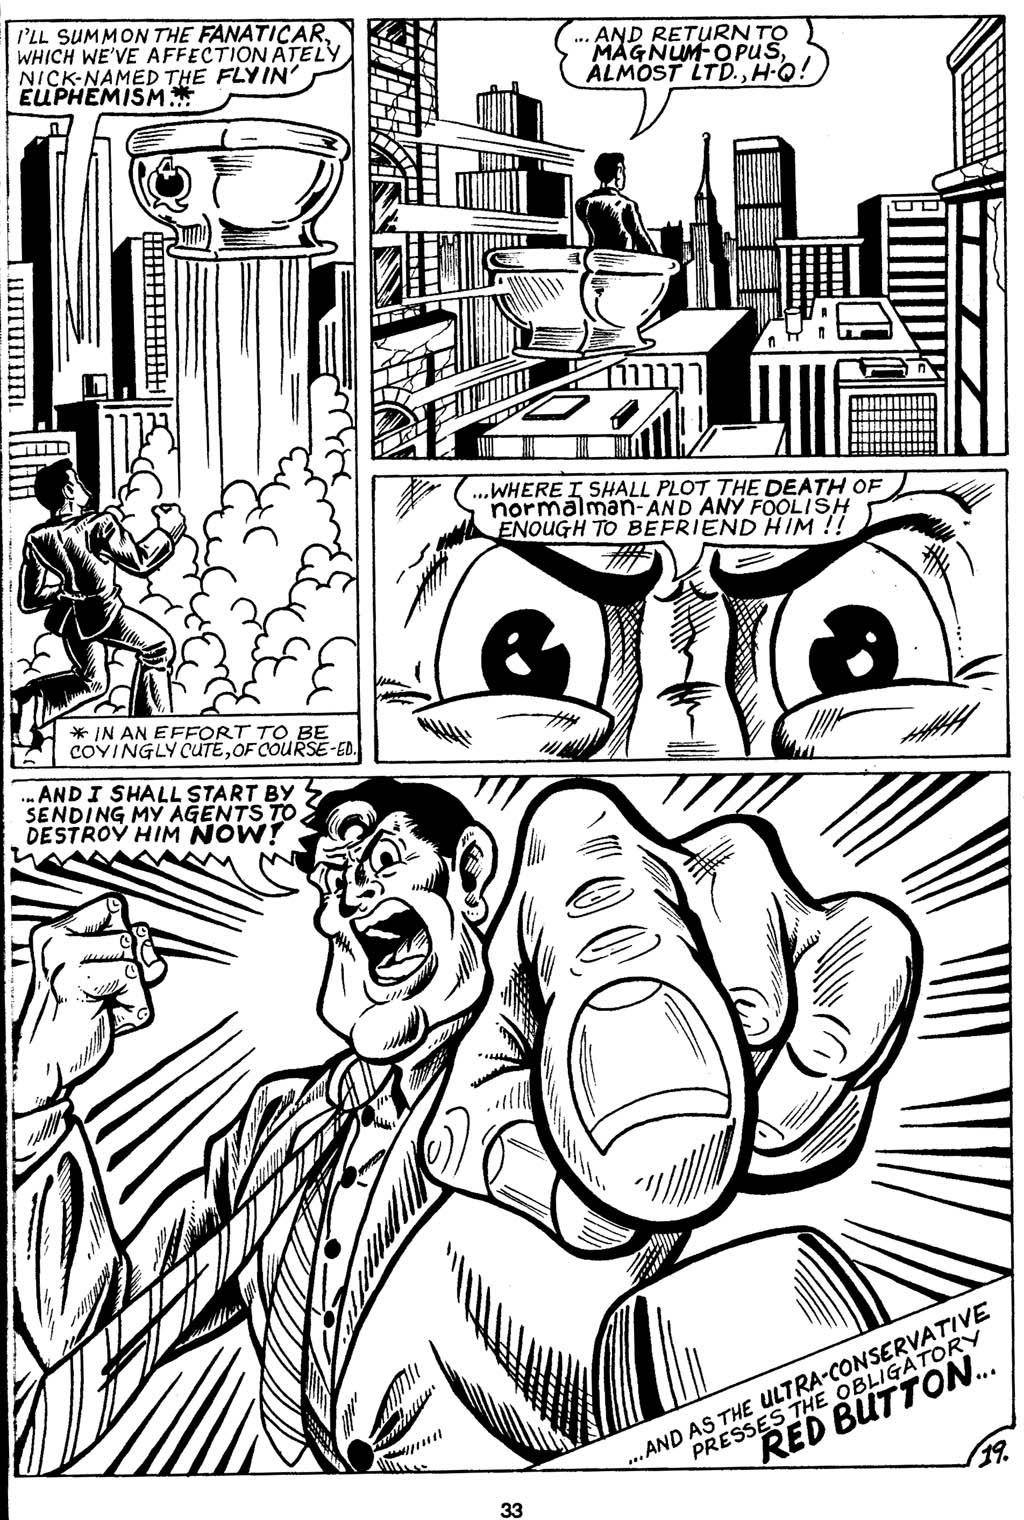 Read online Normalman - The Novel comic -  Issue # TPB (Part 1) - 38